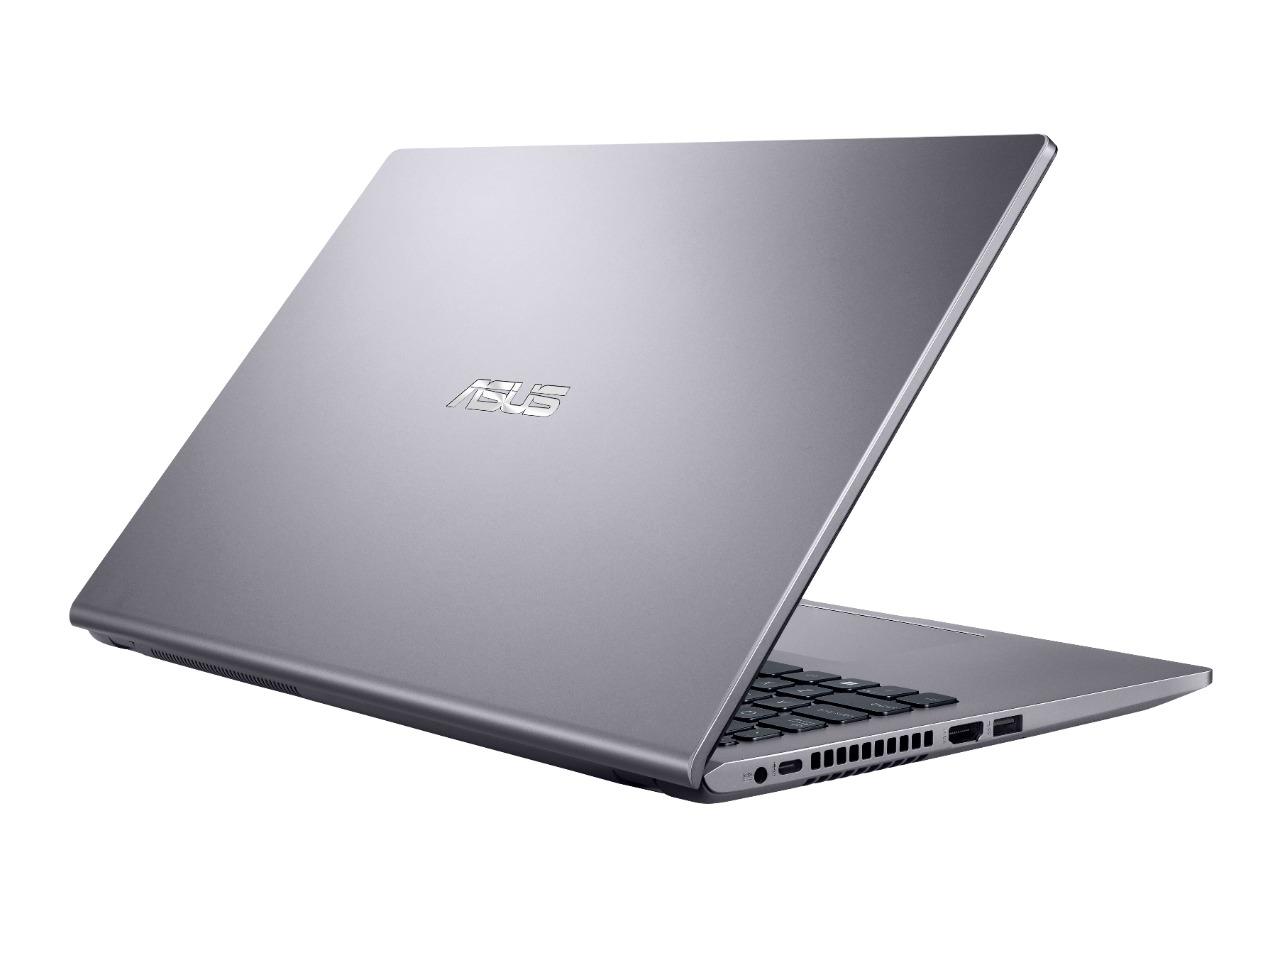 Noutbuk Asus X509JB-EJ059 (90NB0QD2-M01800)  - 4